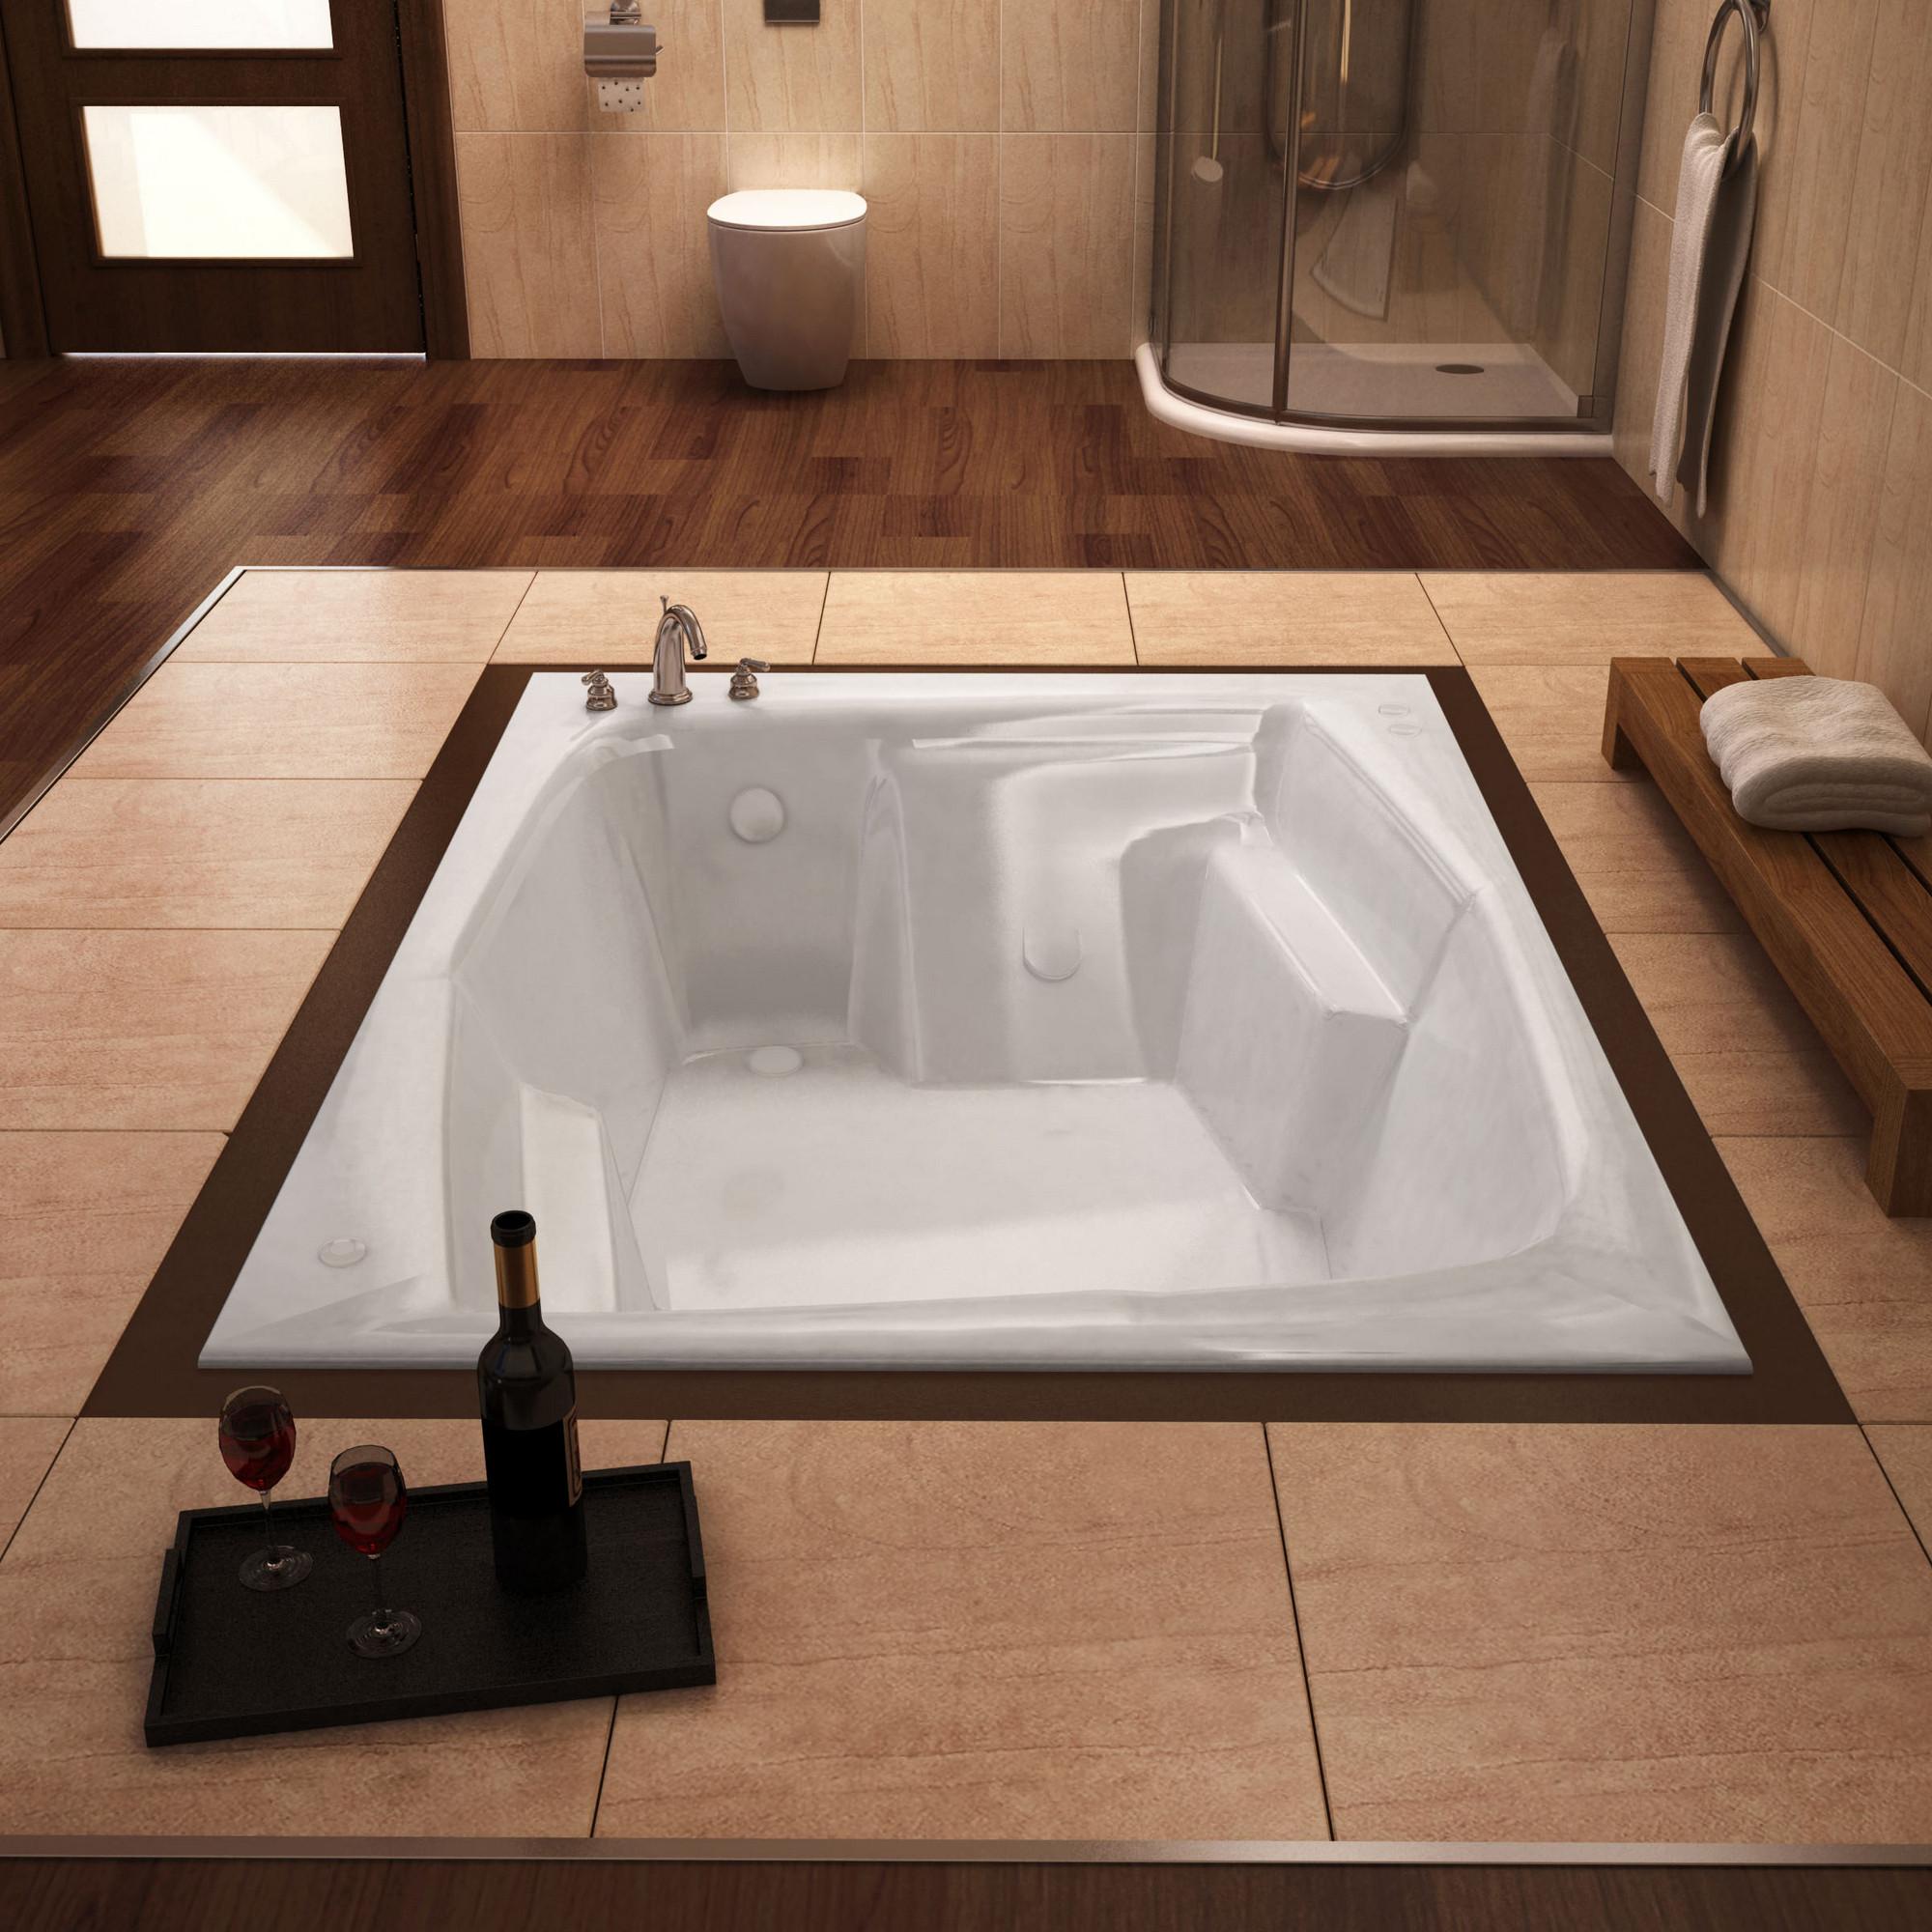 MediTub 5472C Atlantis Caresse Rectangular Acrylic Soaking Bathtub